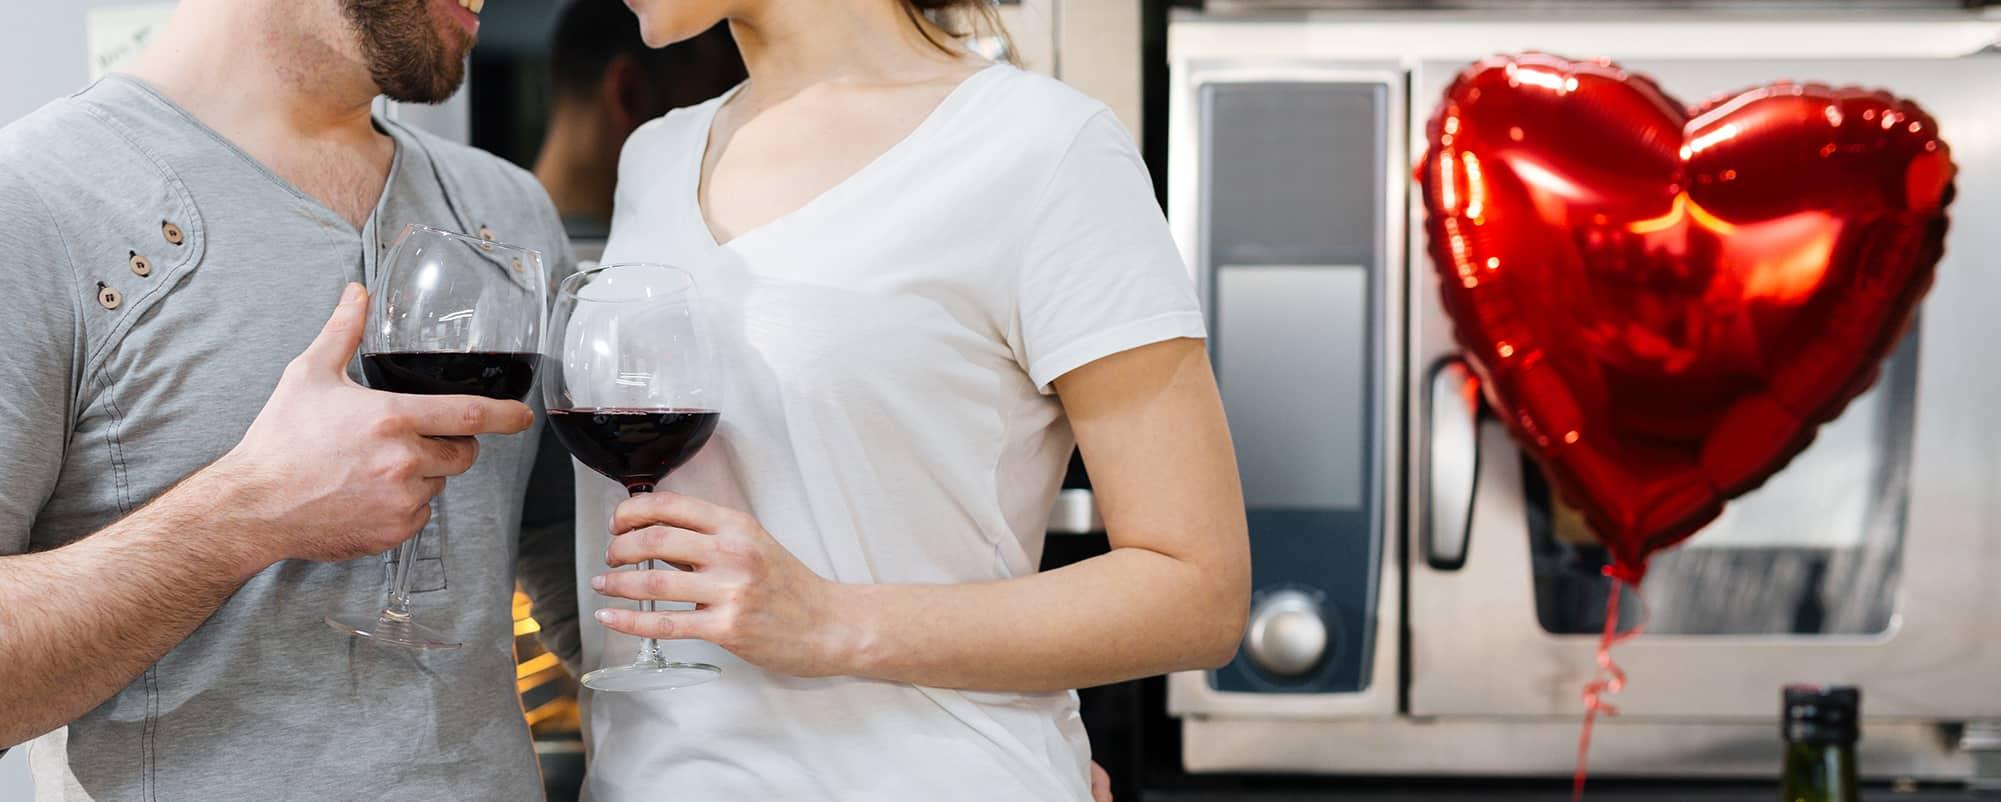 Alcohol can raise cholesterol